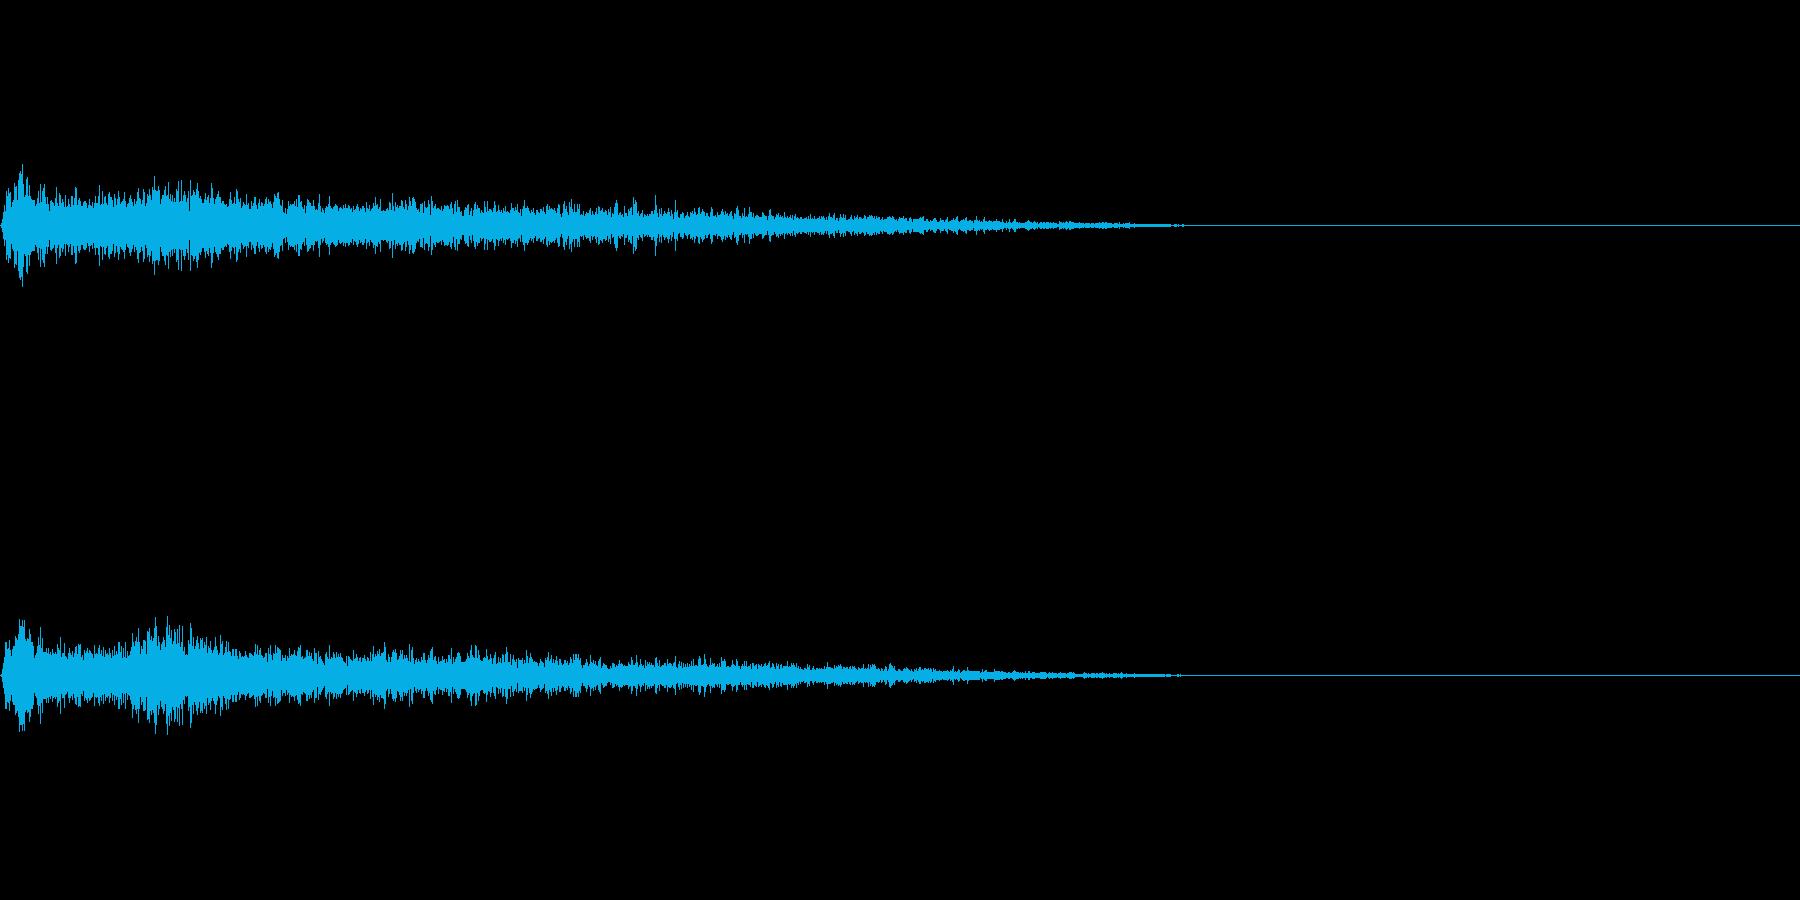 Bメジャー インパクト音 衝撃音の再生済みの波形